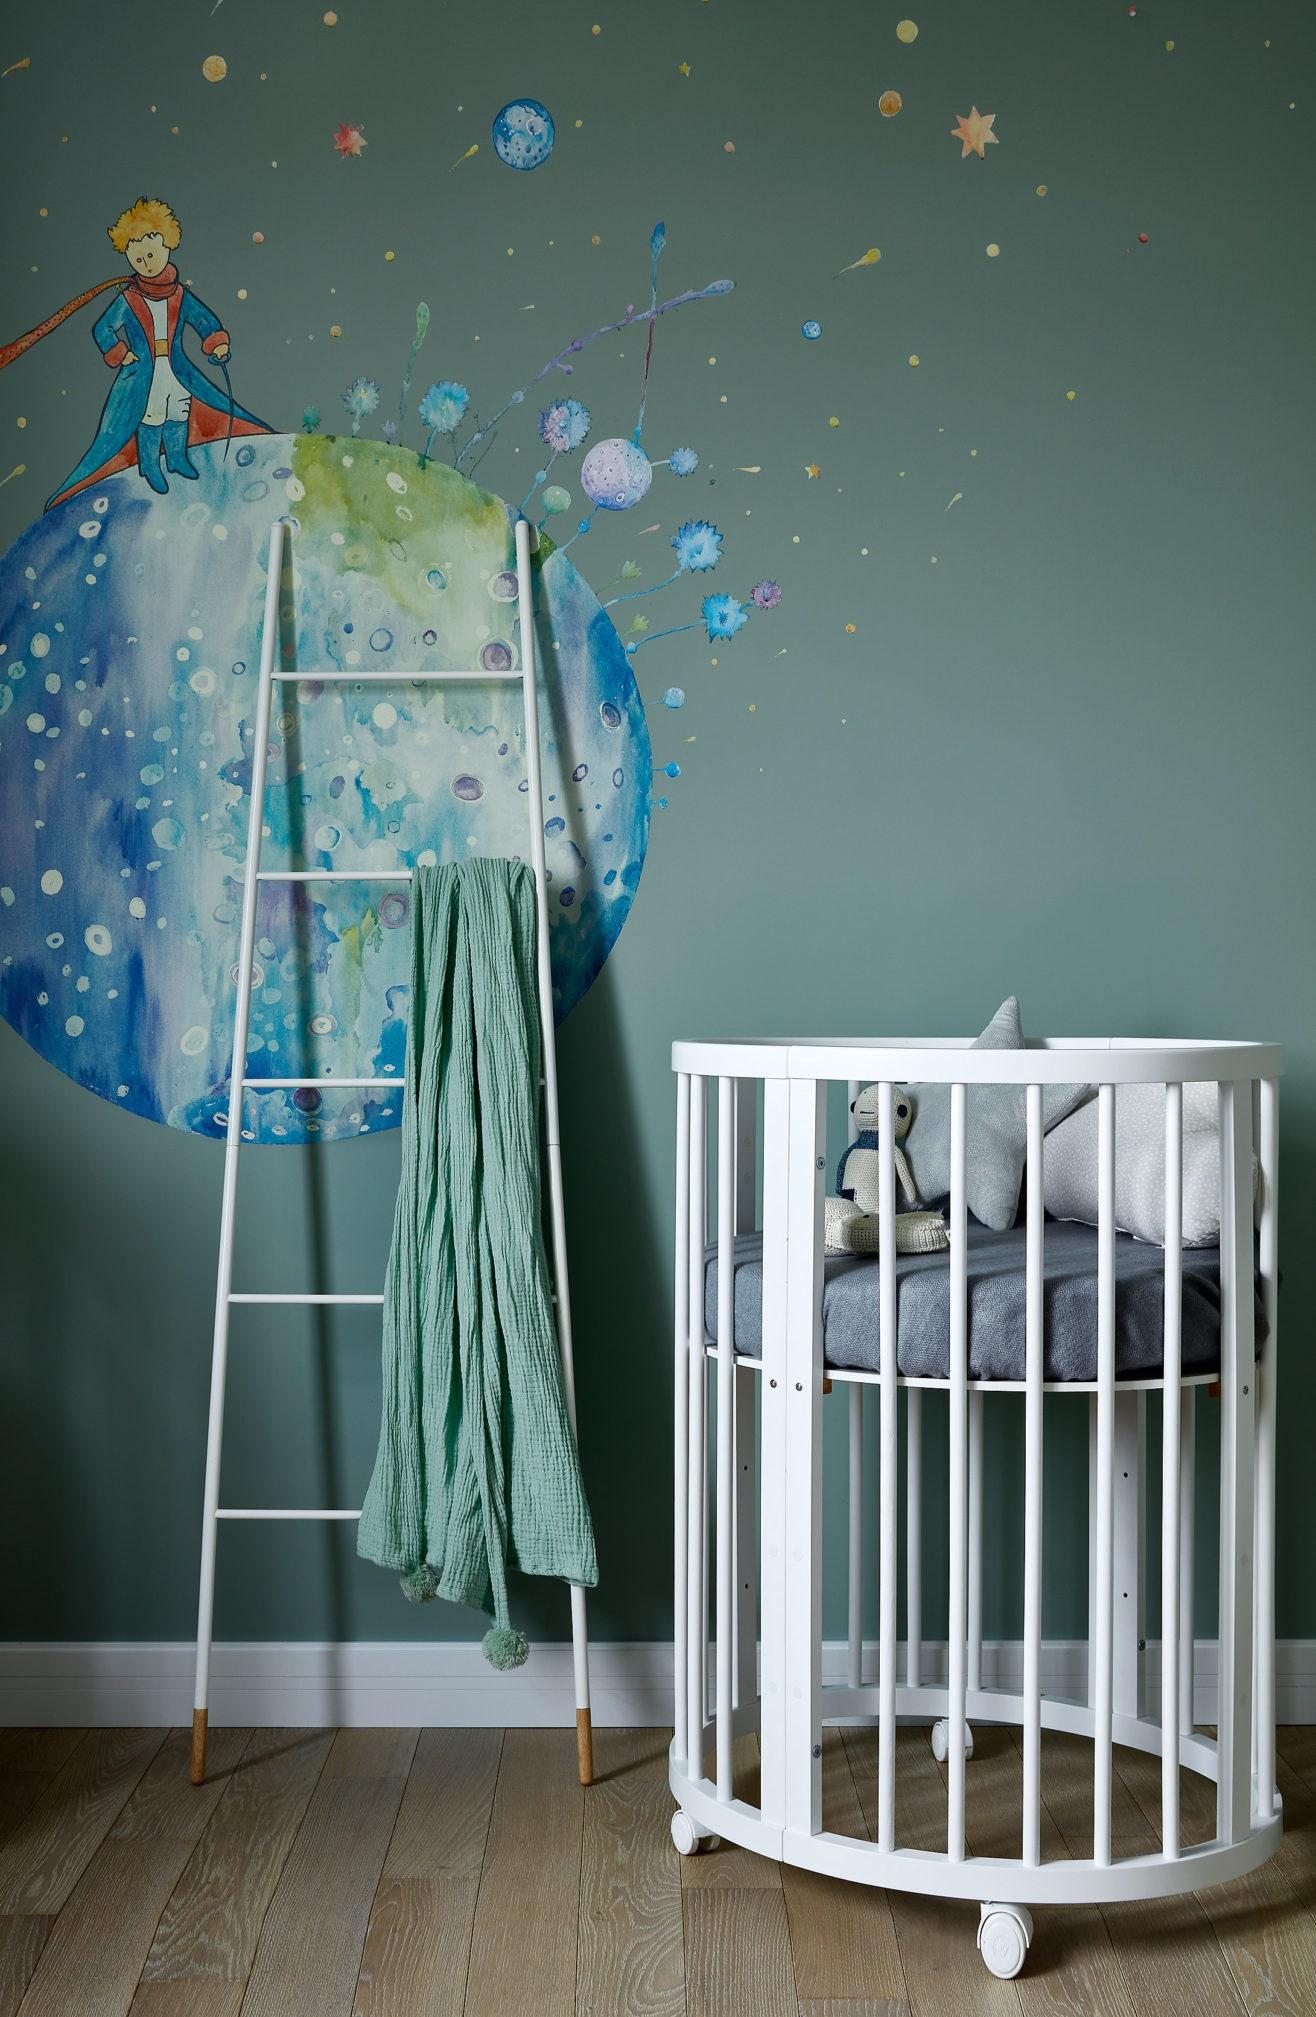 .  Sleep and Smile  Rack Ladder Zuiver  LAppartement   PeakArt.    Aquamarine 138 Little Greene.   .   .